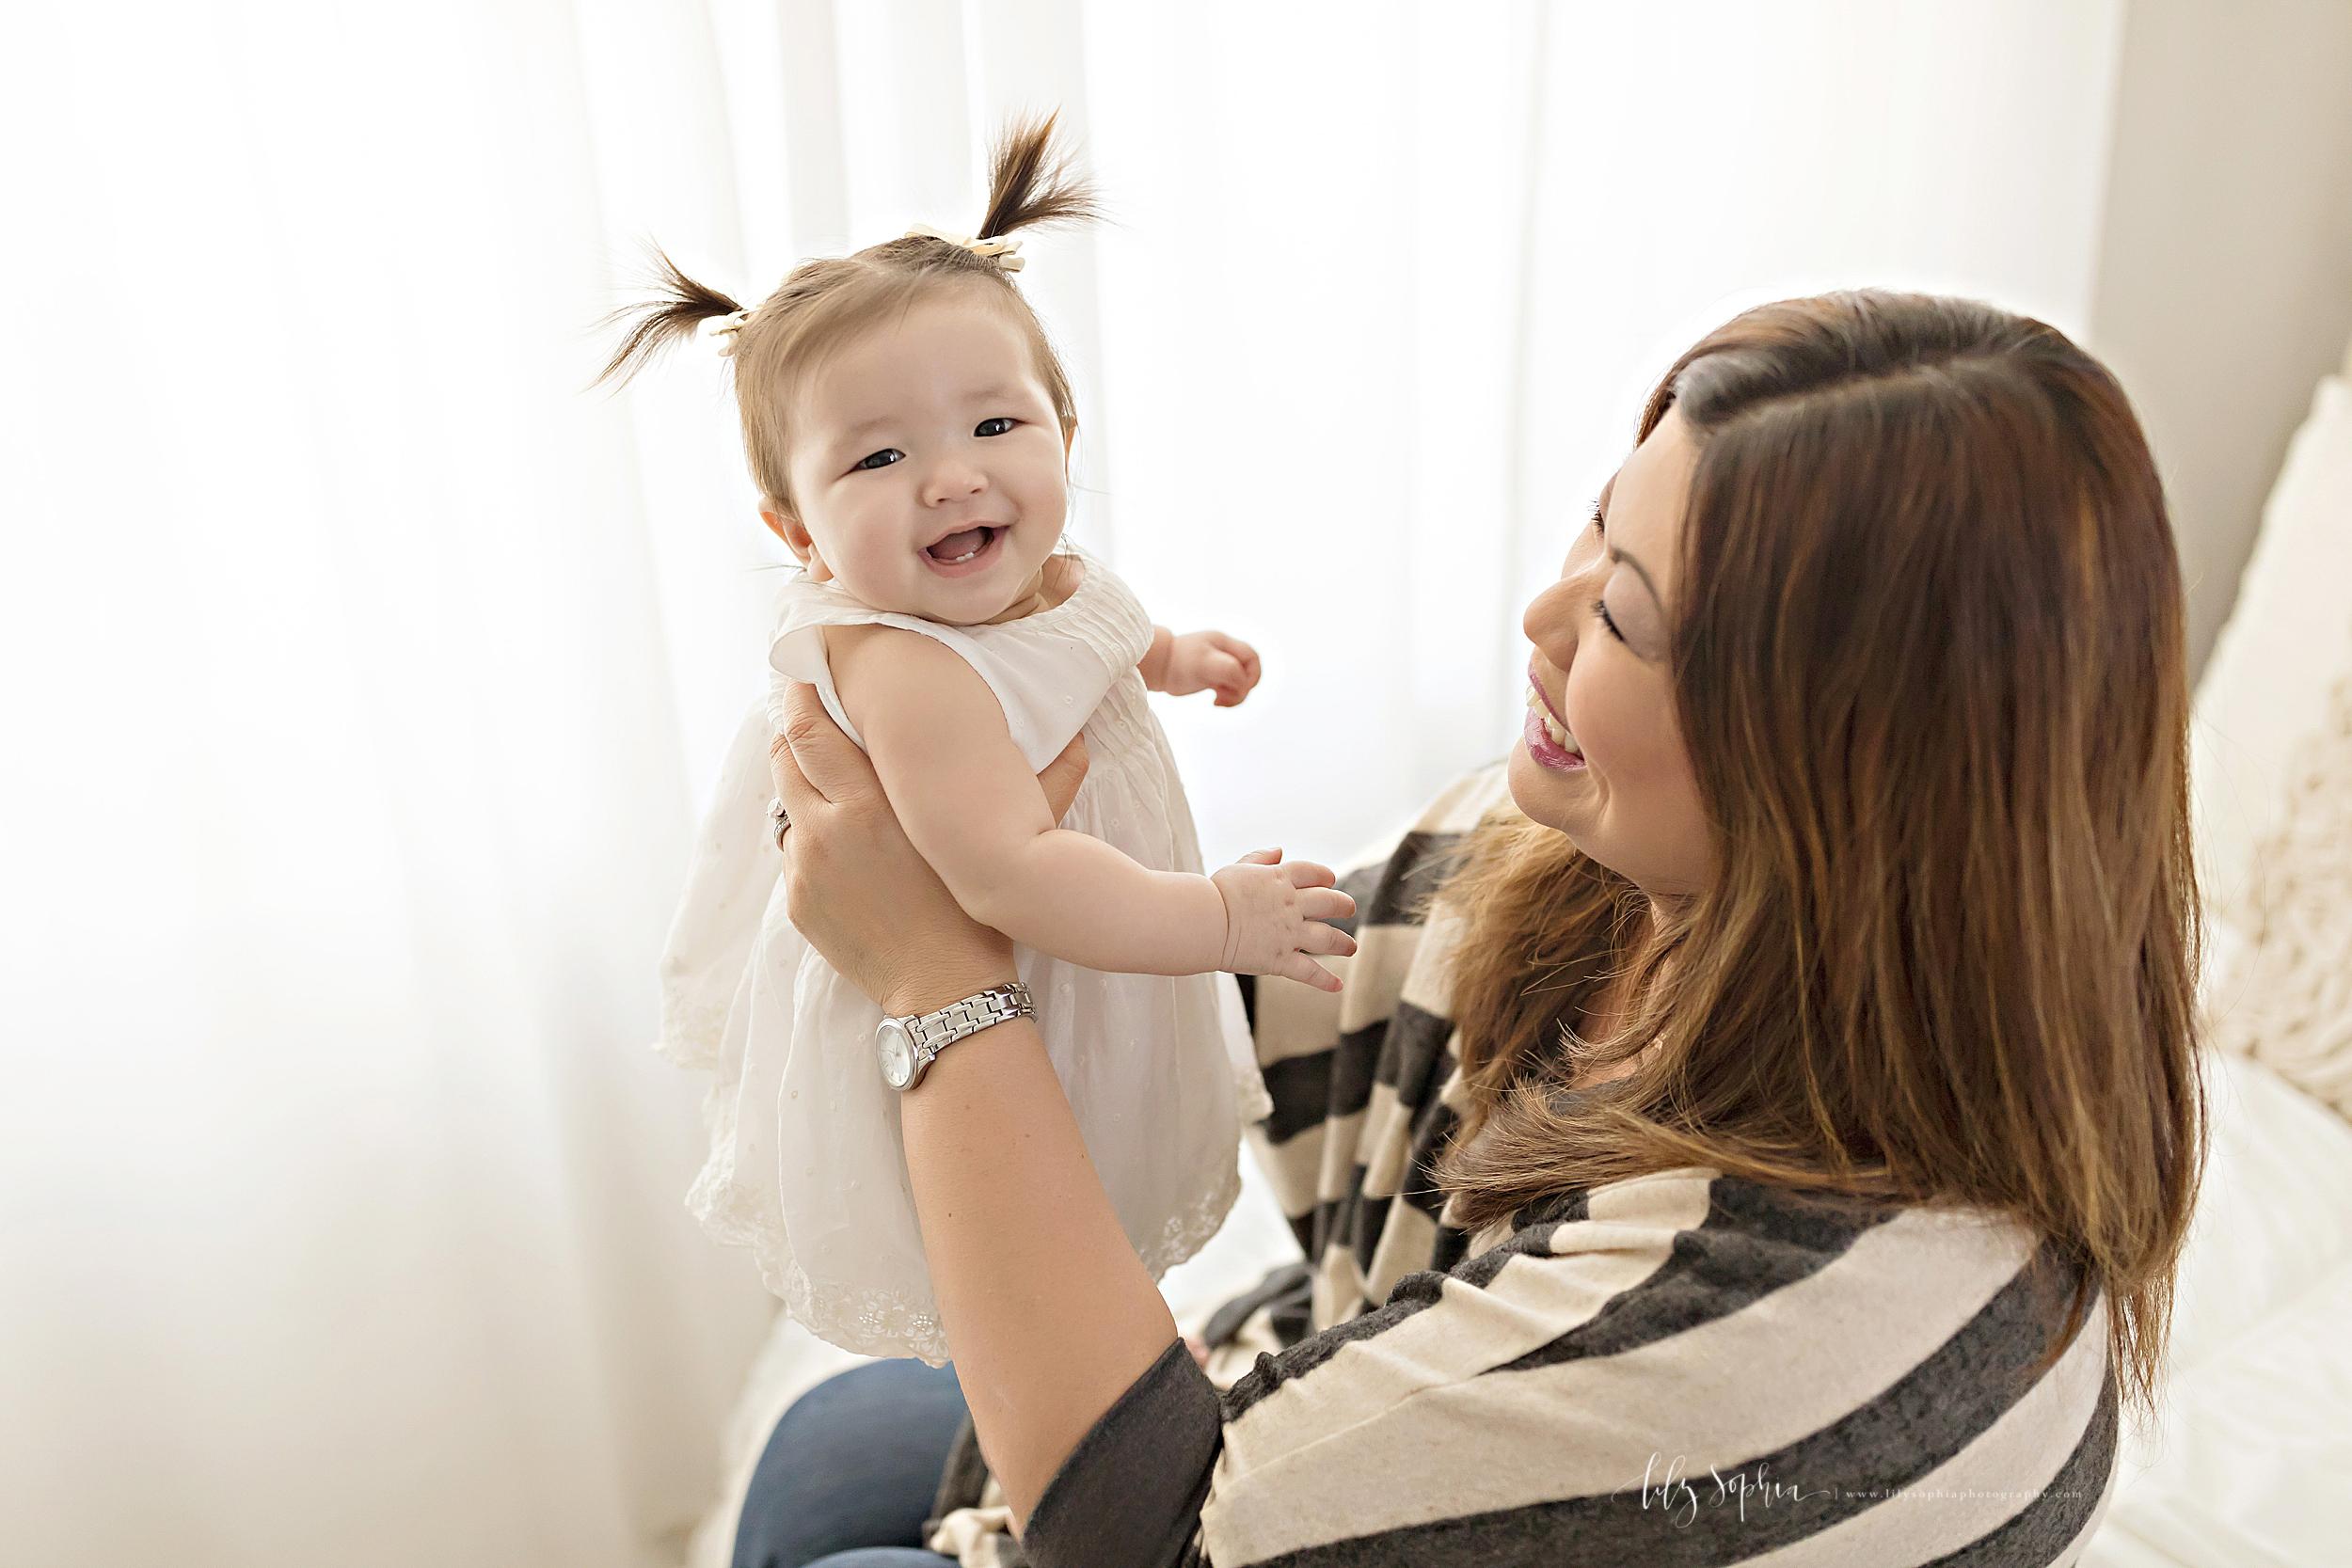 atlanta-midtown-brookhaven-decatur-lily-sophia-photography-photographer-portraits-grant-park-studio-six-month-milestone-baby-girl-big-sister-family_0109.jpg